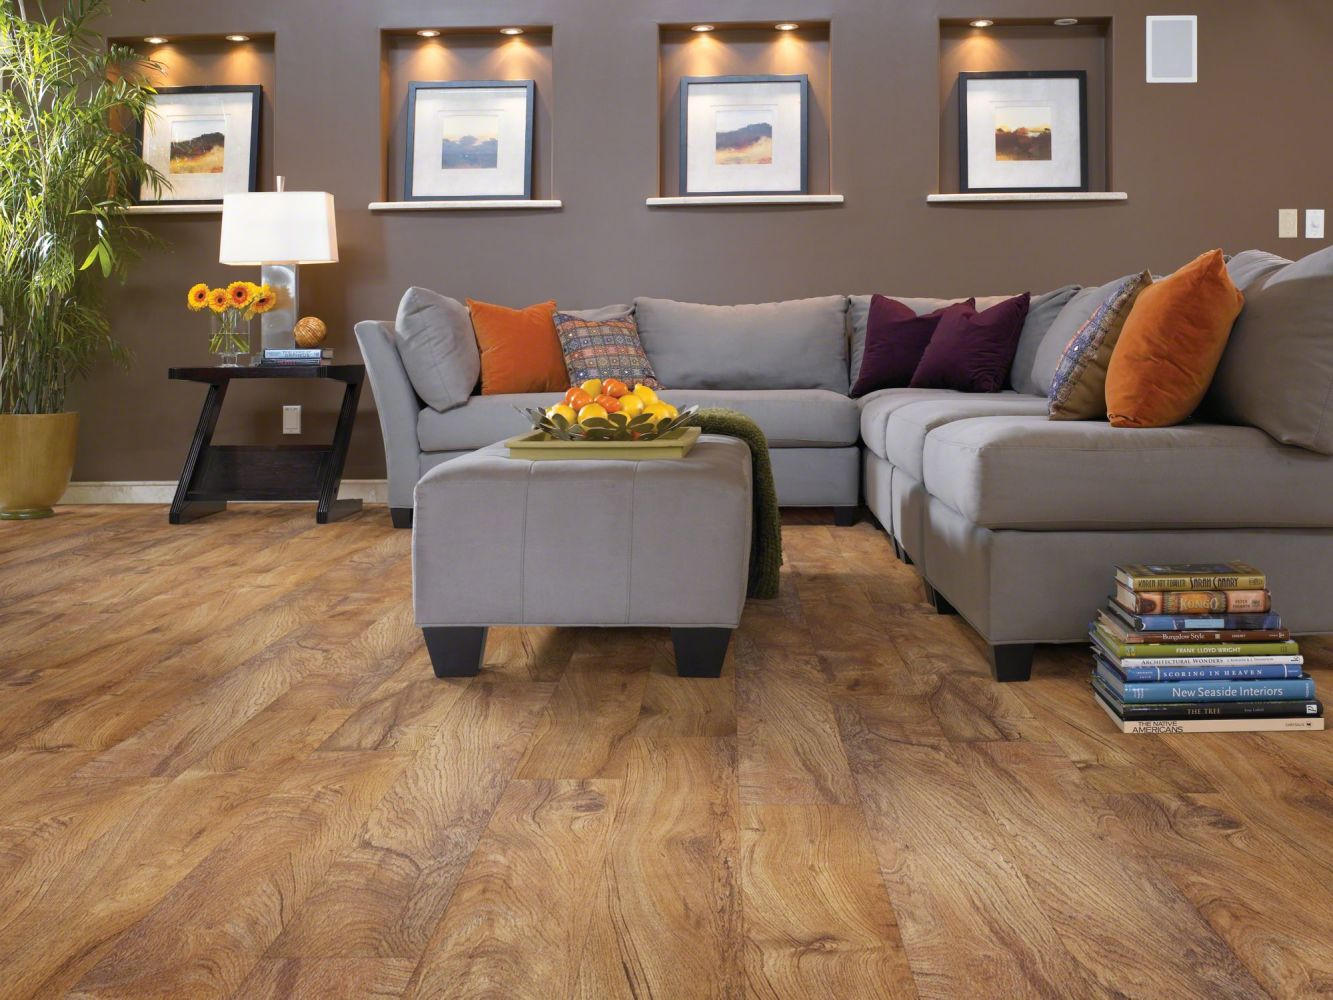 Shaw Floors Nfa HS Barton Plus Tropic 00600_VH516